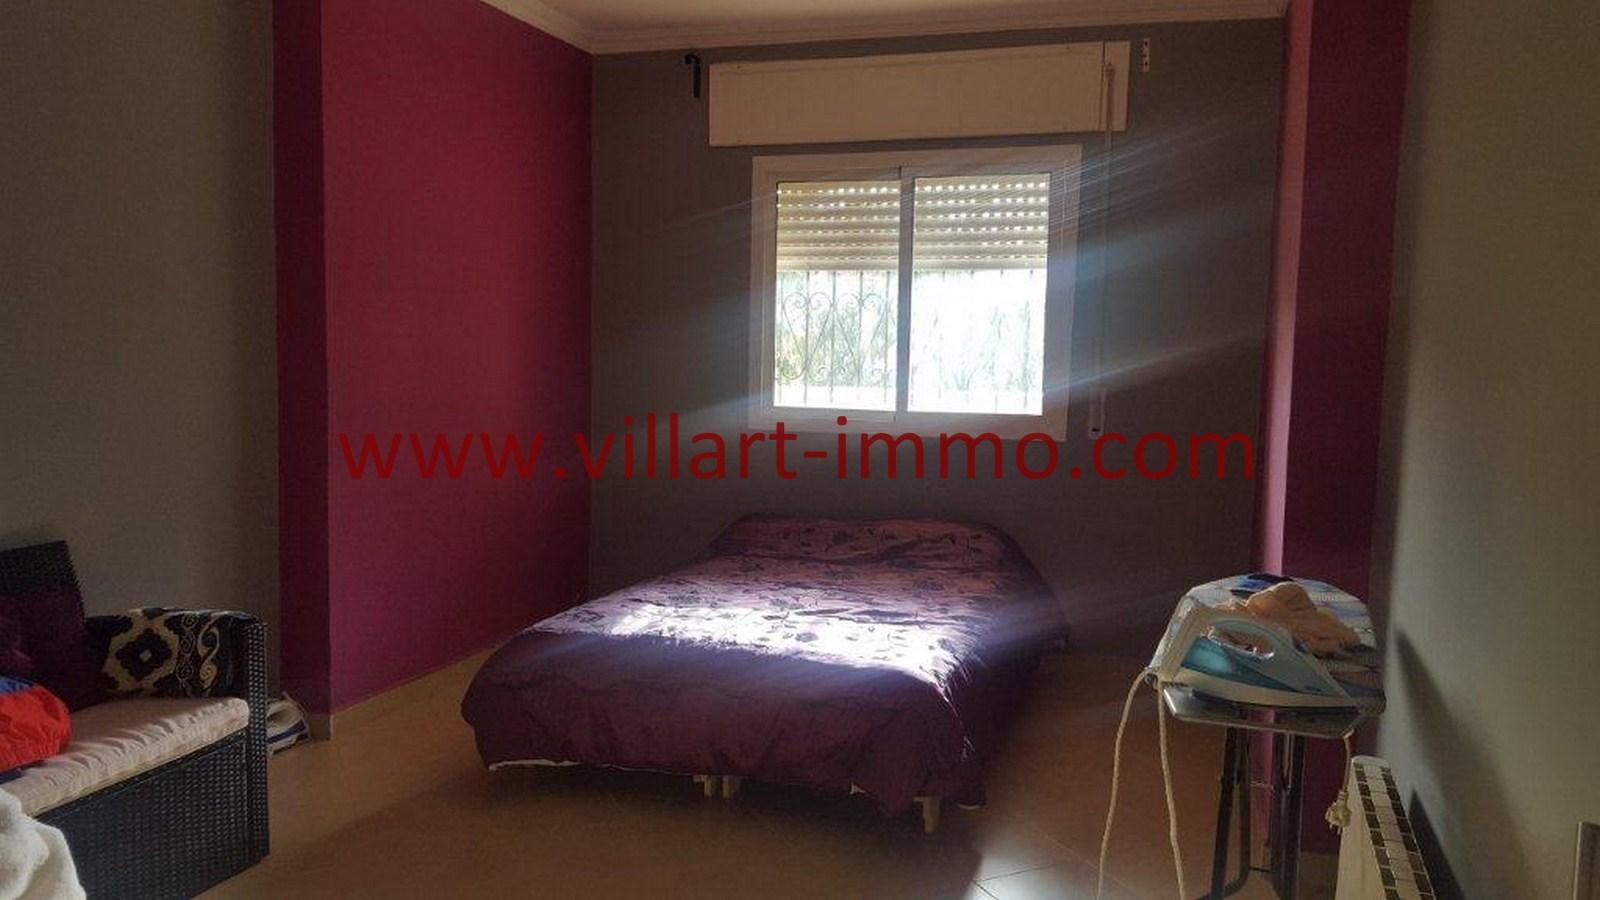 3-Vente-Appartement-Tanger-Val fleuri -Chambre-VA484-Villart Immo